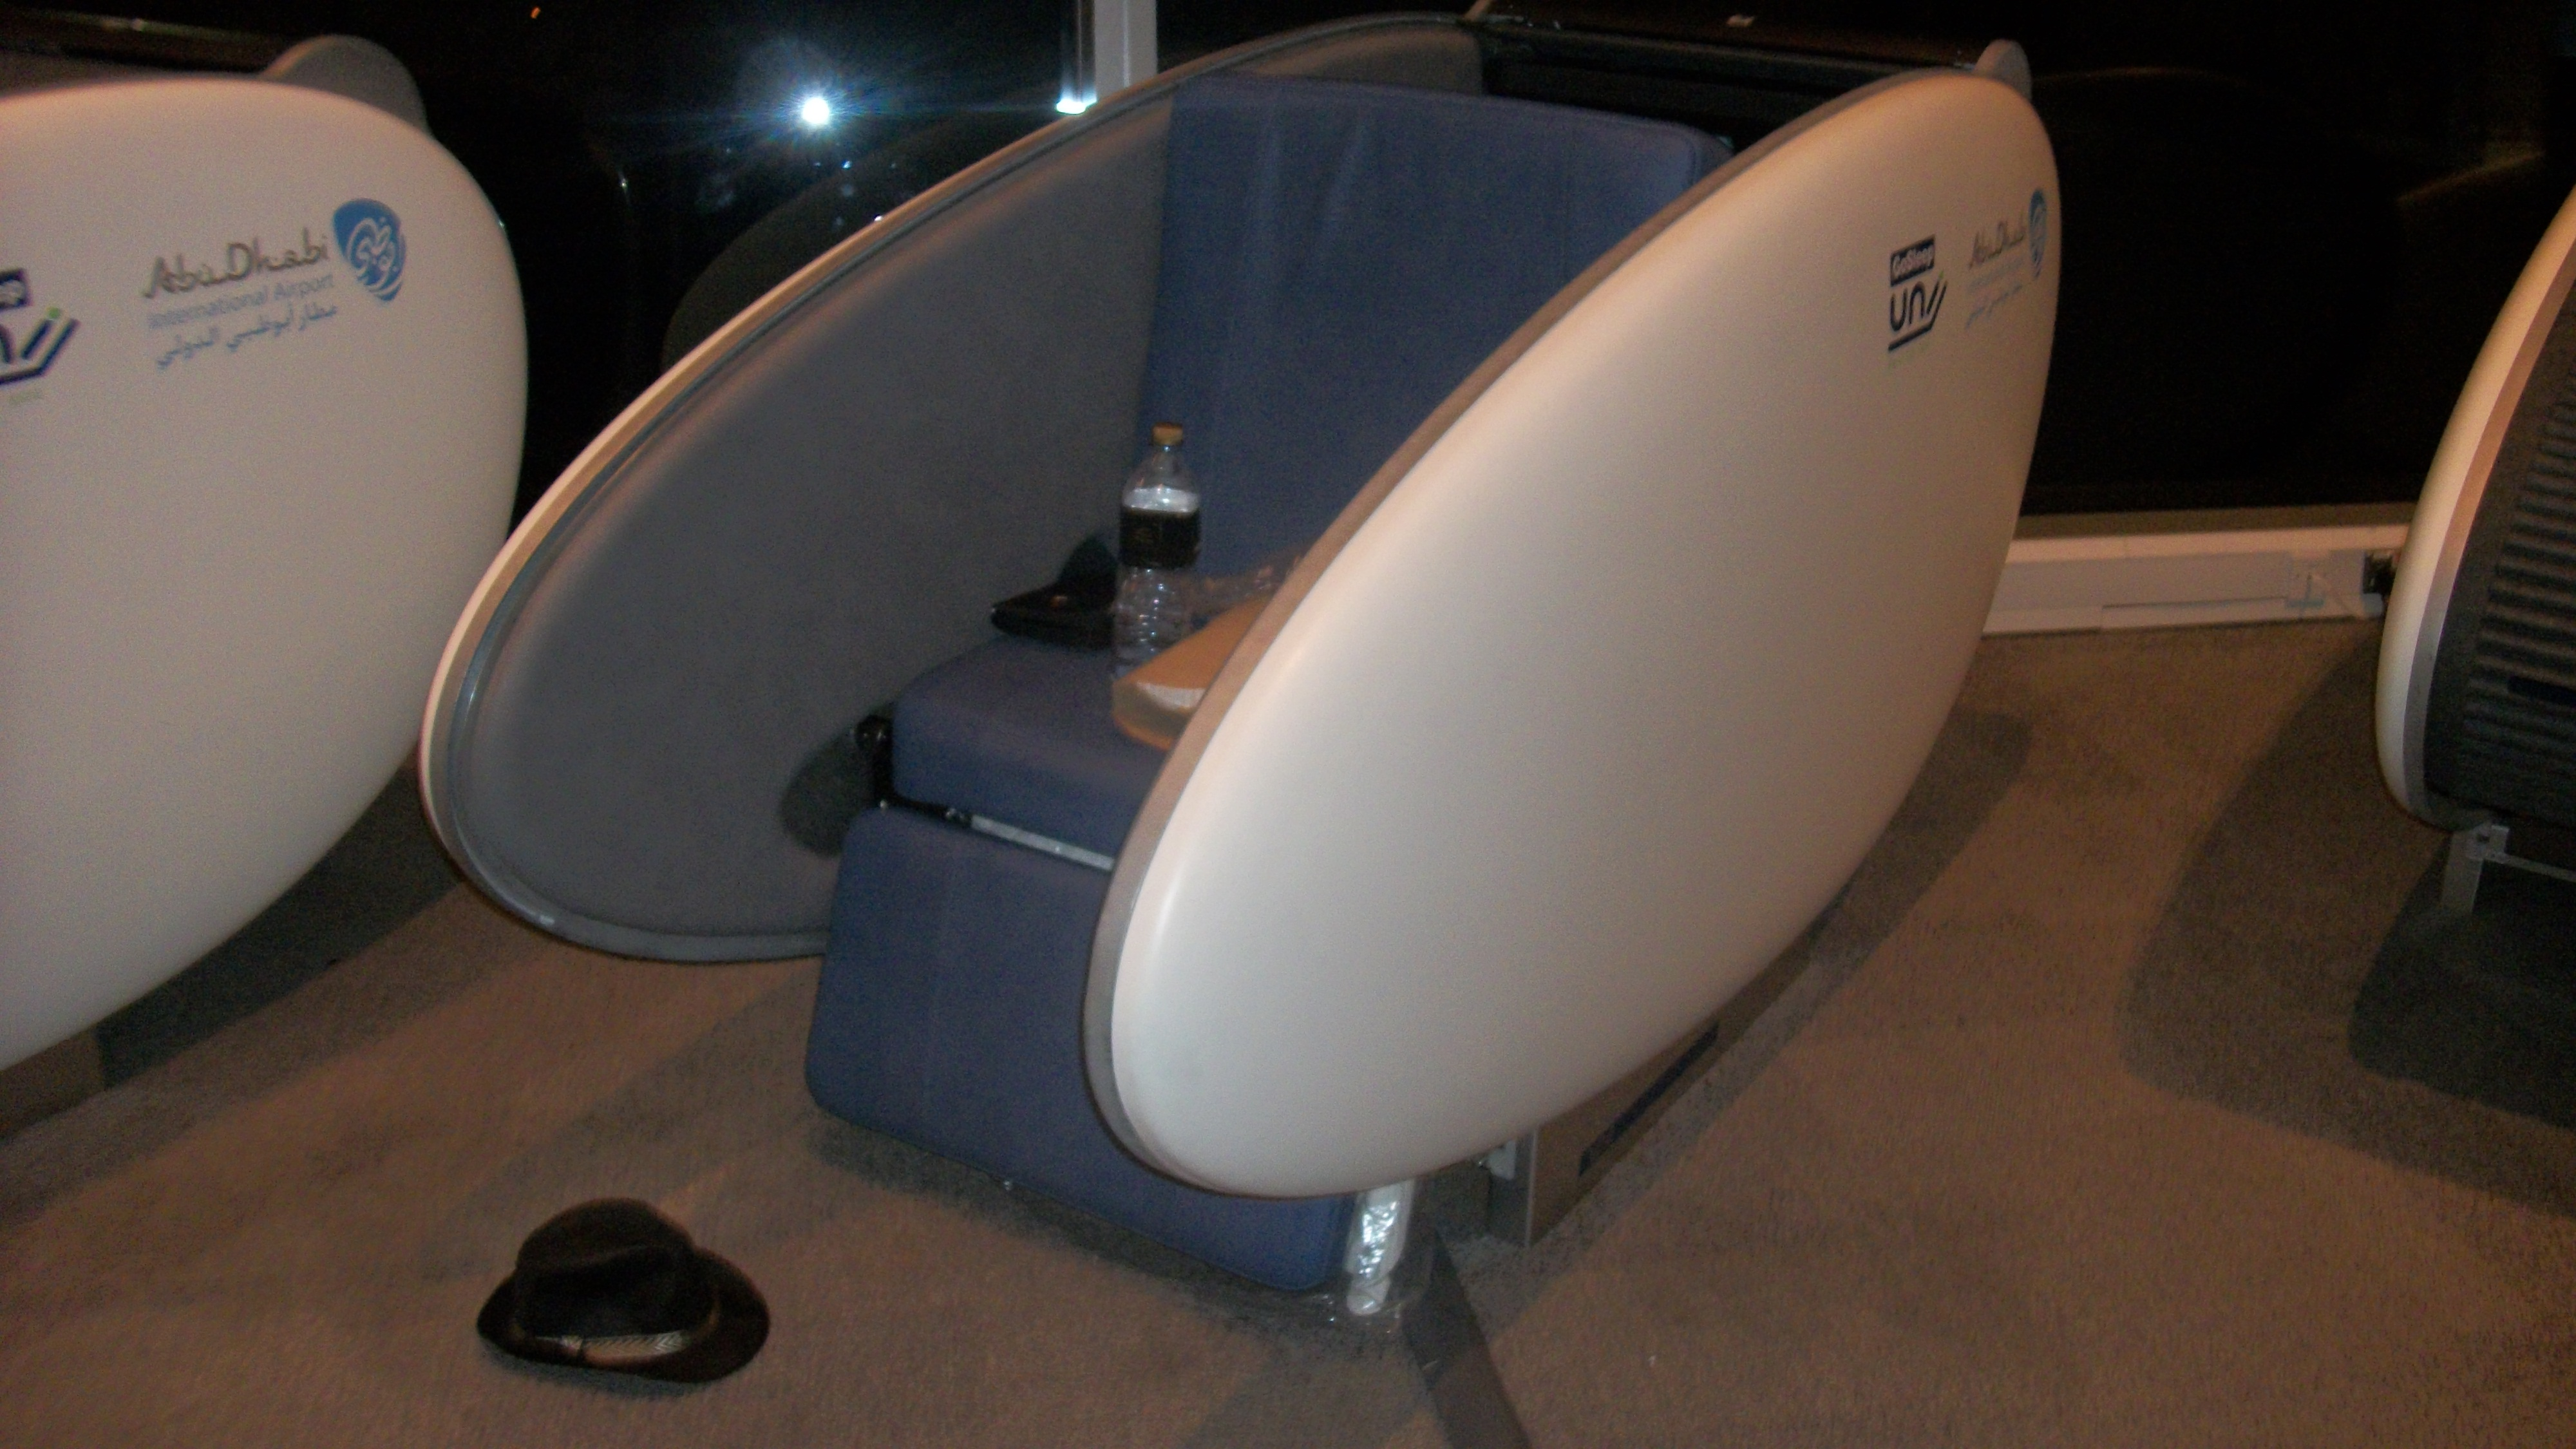 abu dhabi airport installs gosleep sleeping pods